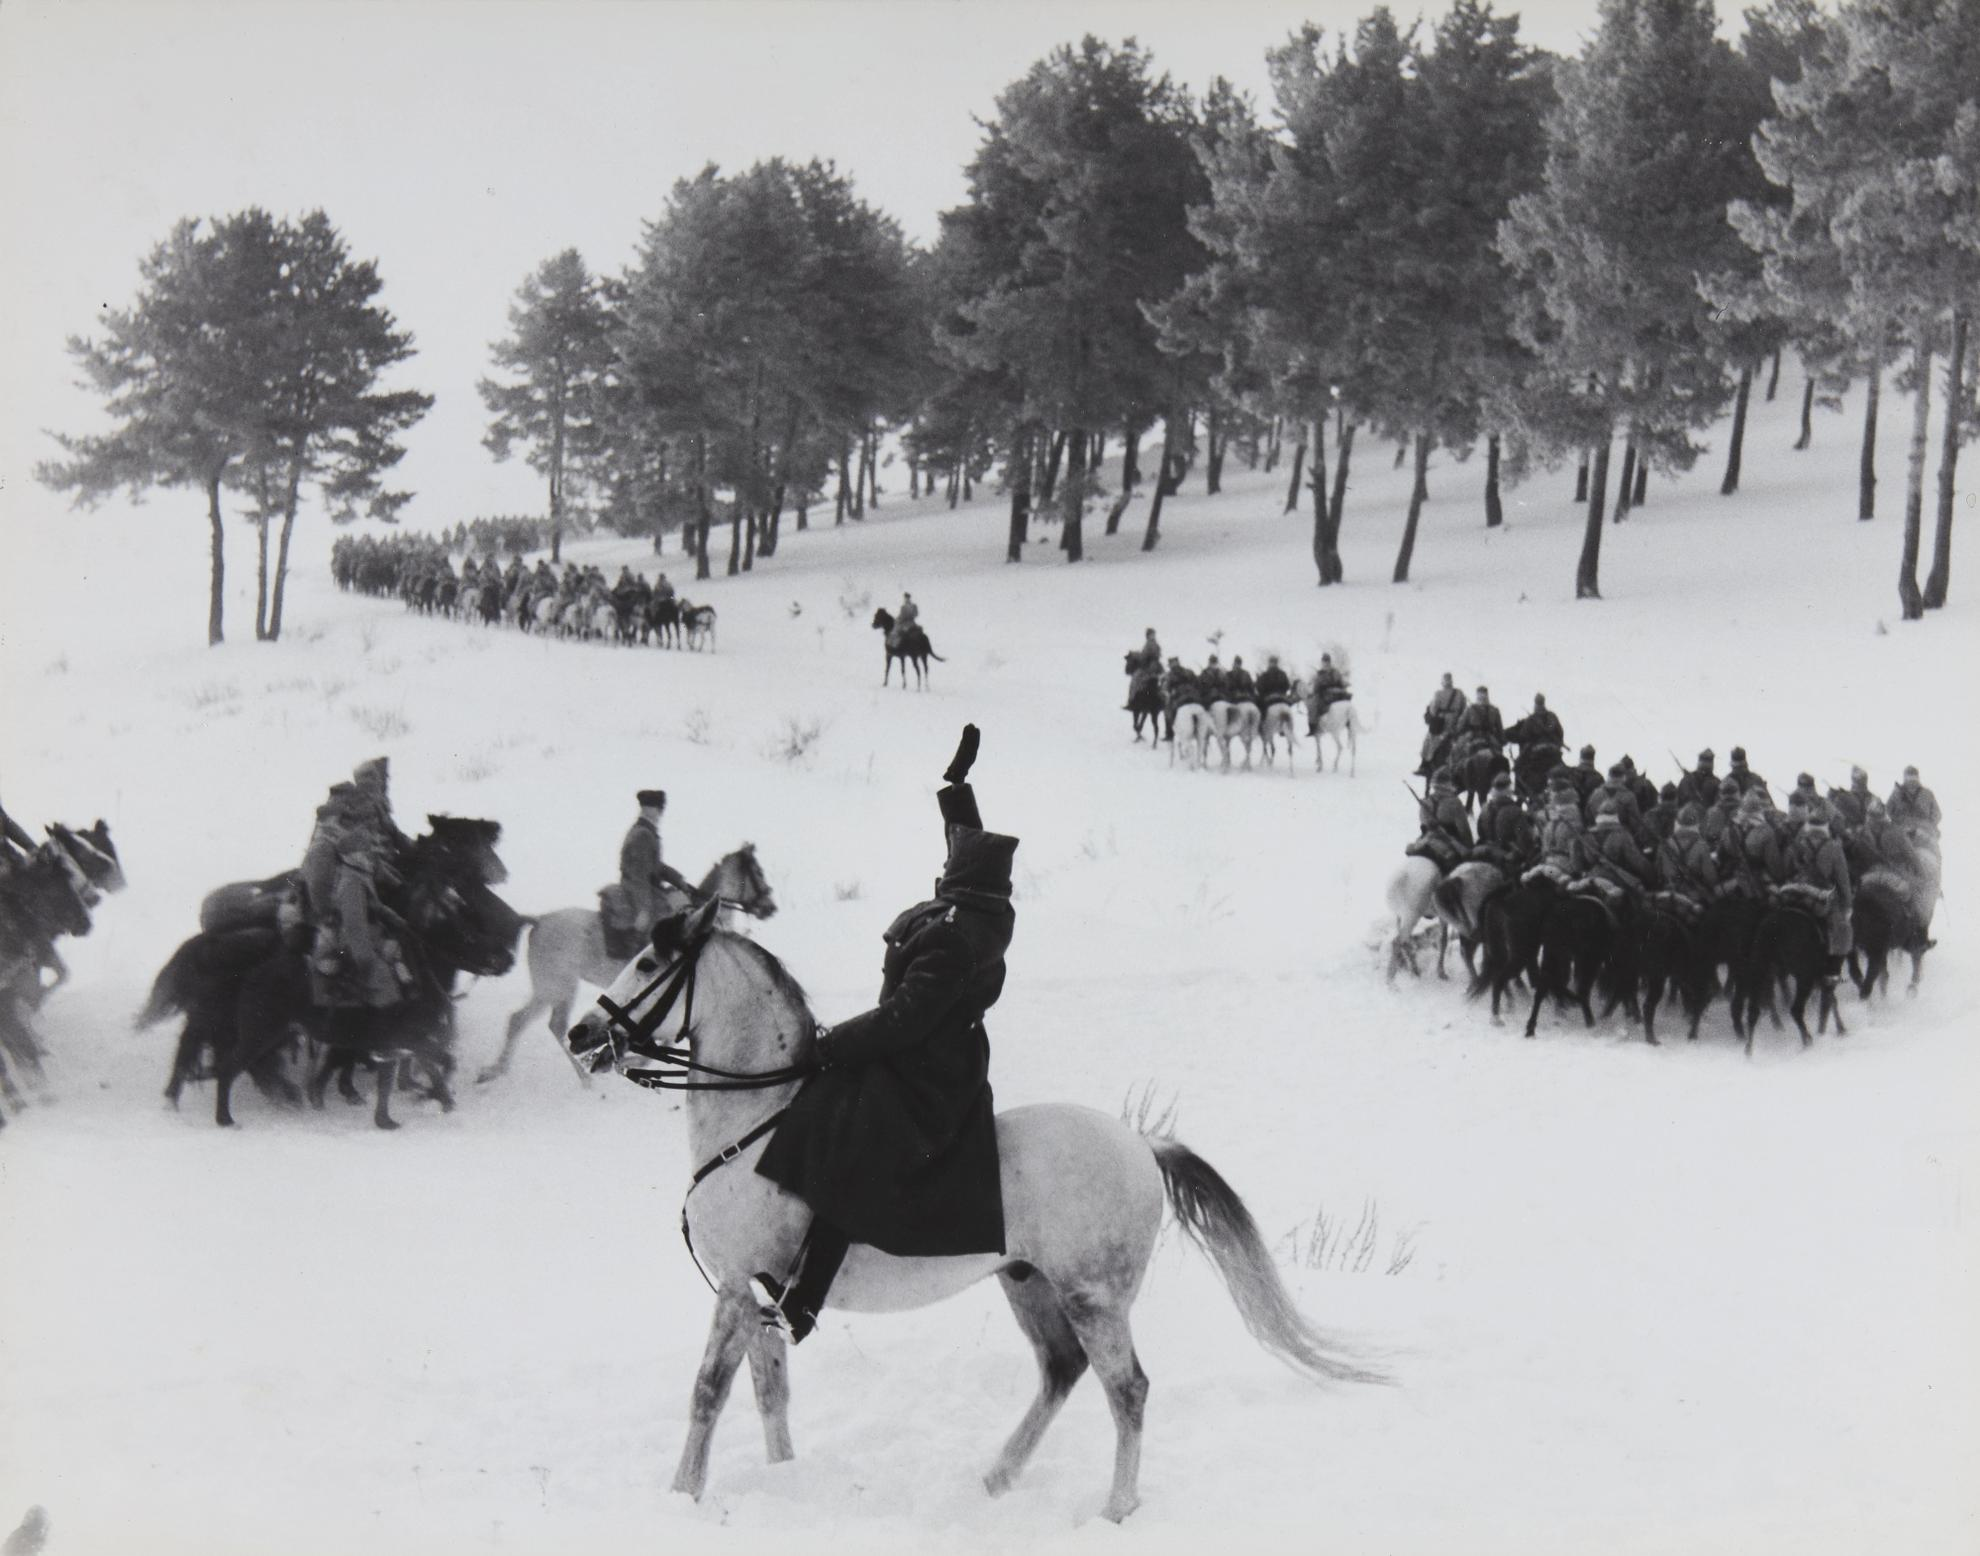 David Douglas Duncan - Turkish Cavalry Maneuvers-1948